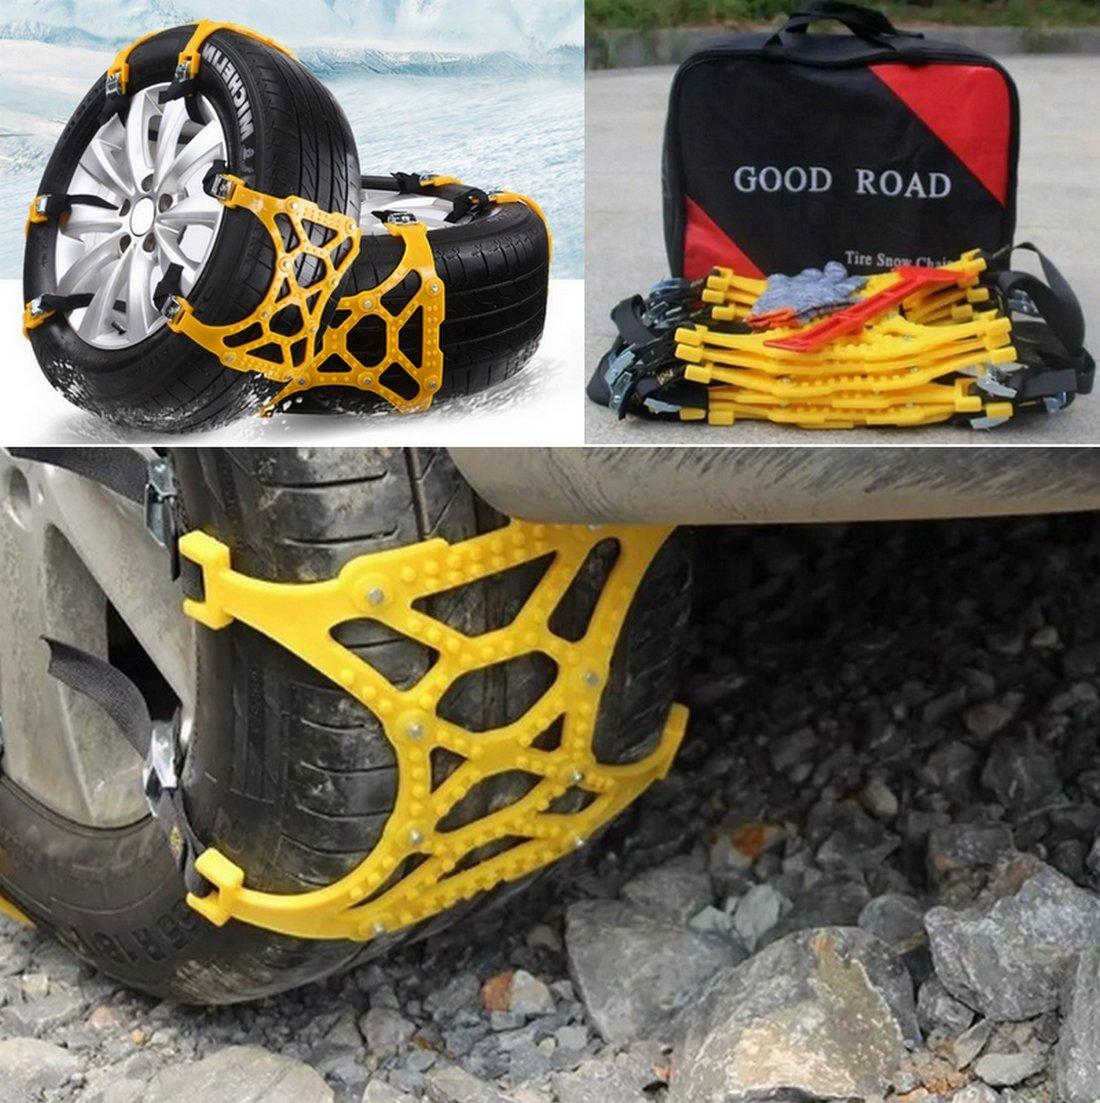 Junyun Universal Anti Snow Tire Chains/Slip Chanins/Snow Tire Chains of Car,SUV, 6 pcs Adjustable Emergency Pure Tendon Thickening Anti-skid Chains + Glove + Snow Shovel Ice Crusher Scraper (Yellow)